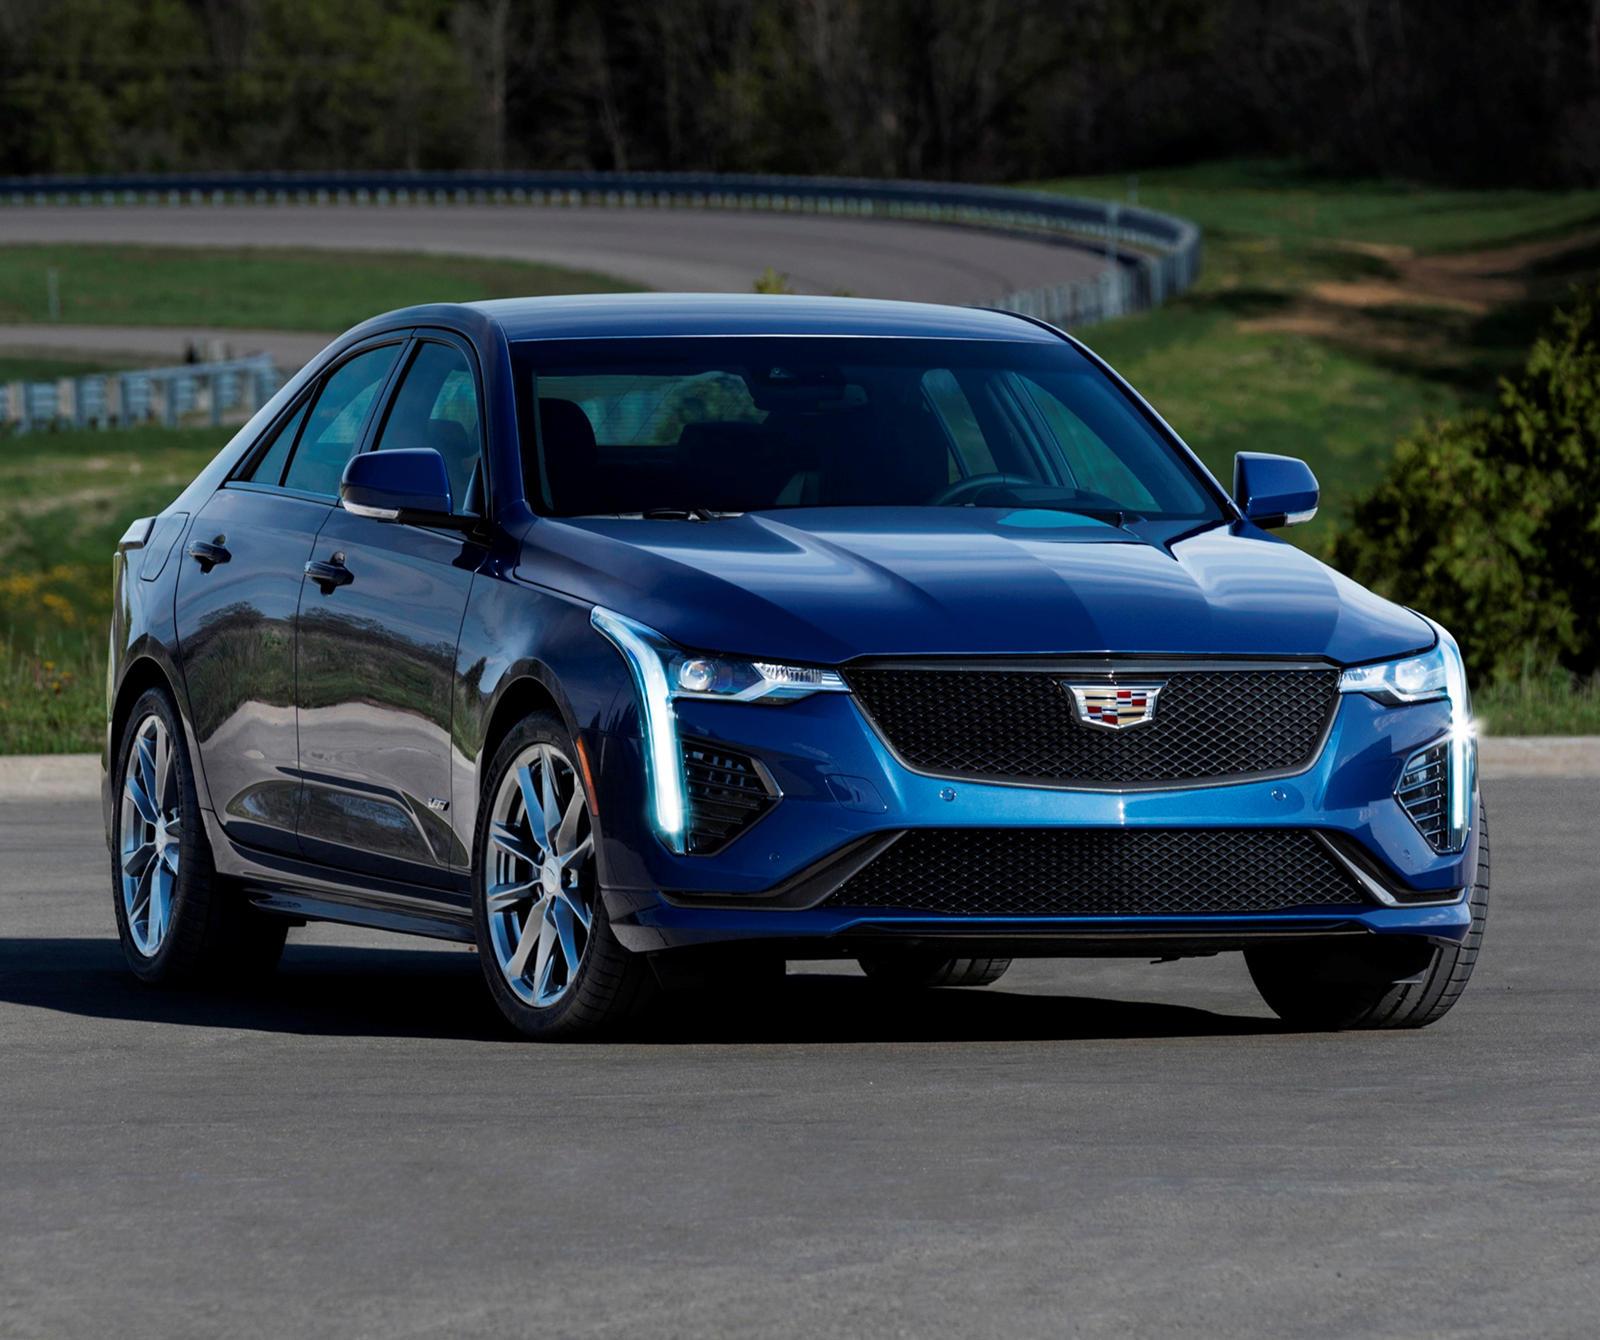 2020 Cadillac CT4-V Ve CT5-V'nin Fiyatları Belli Oldu